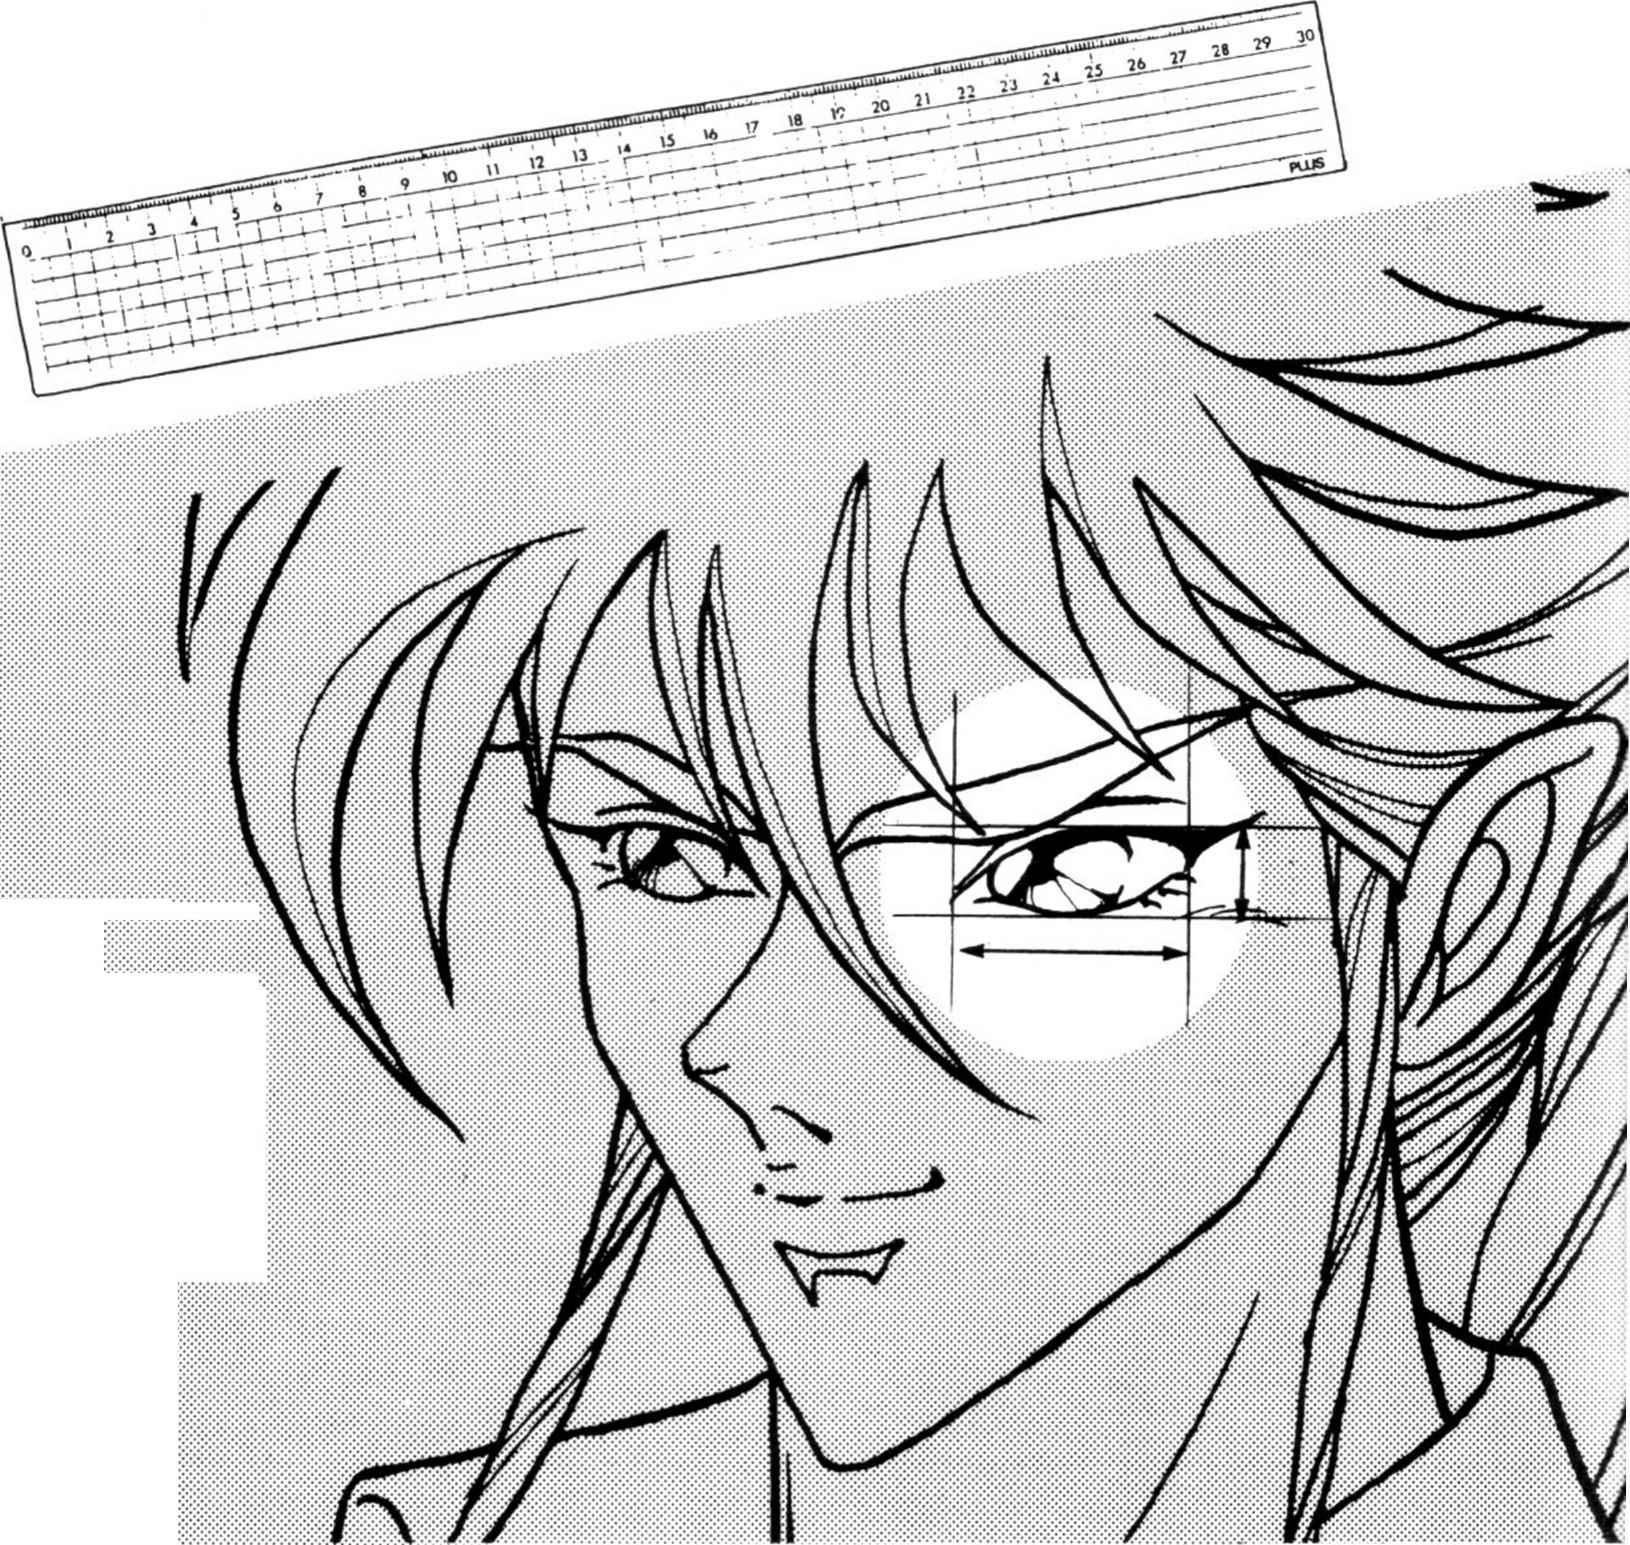 How To Draw Manga Clothes - Draw Manga - Joshua Nava Arts